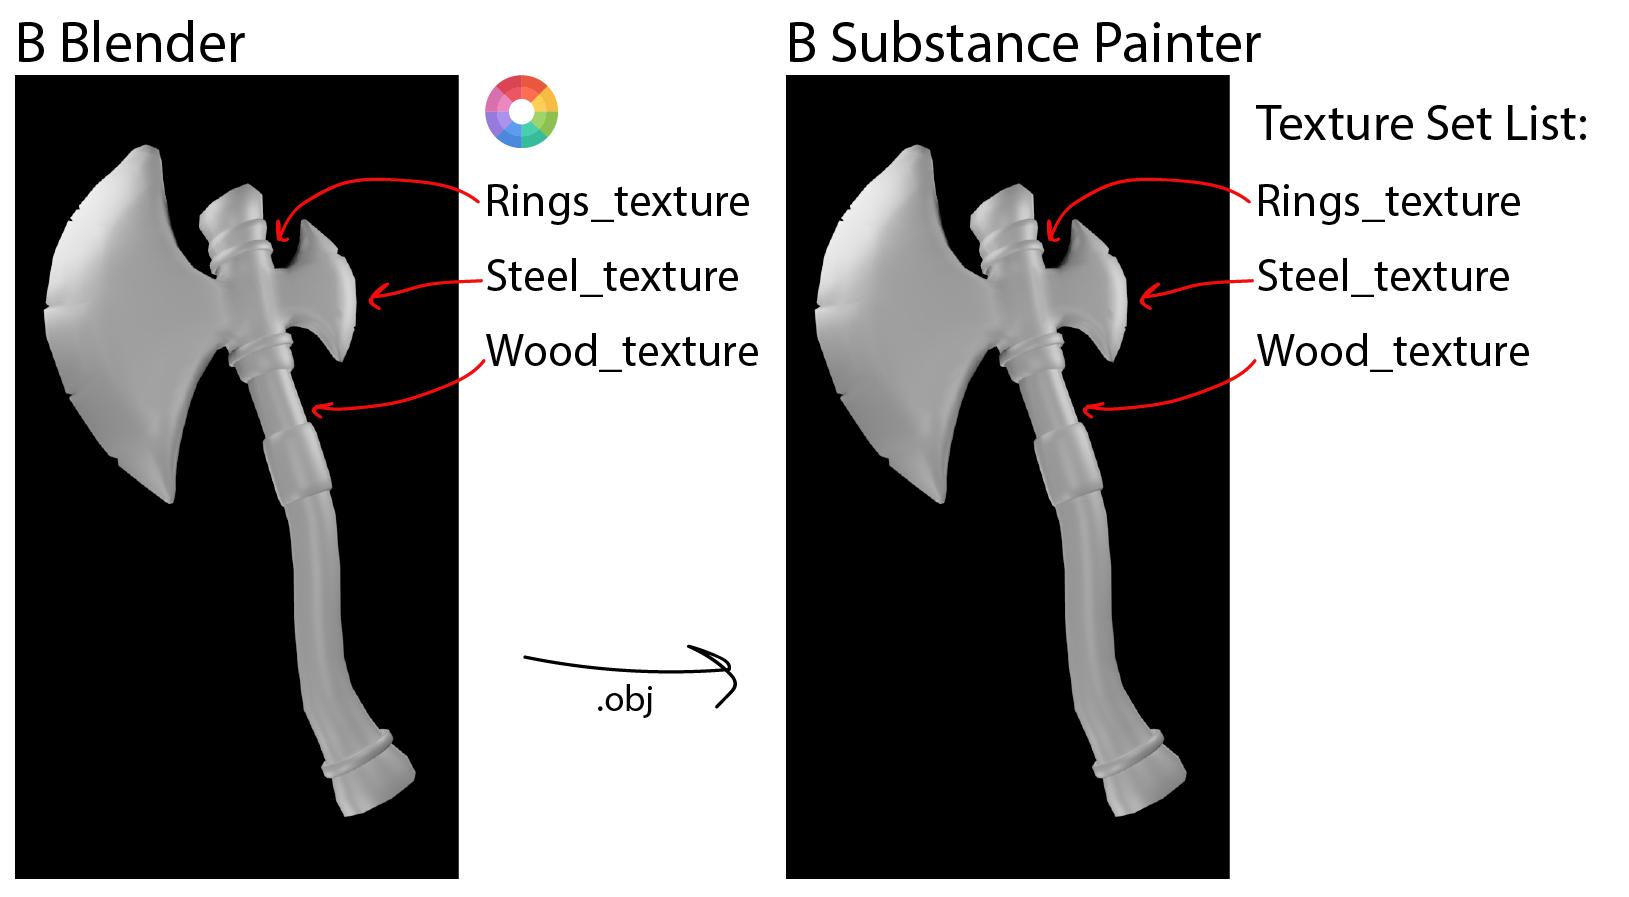 Merge texture sets, или как делать один набор текстур в Substance Painter - 2